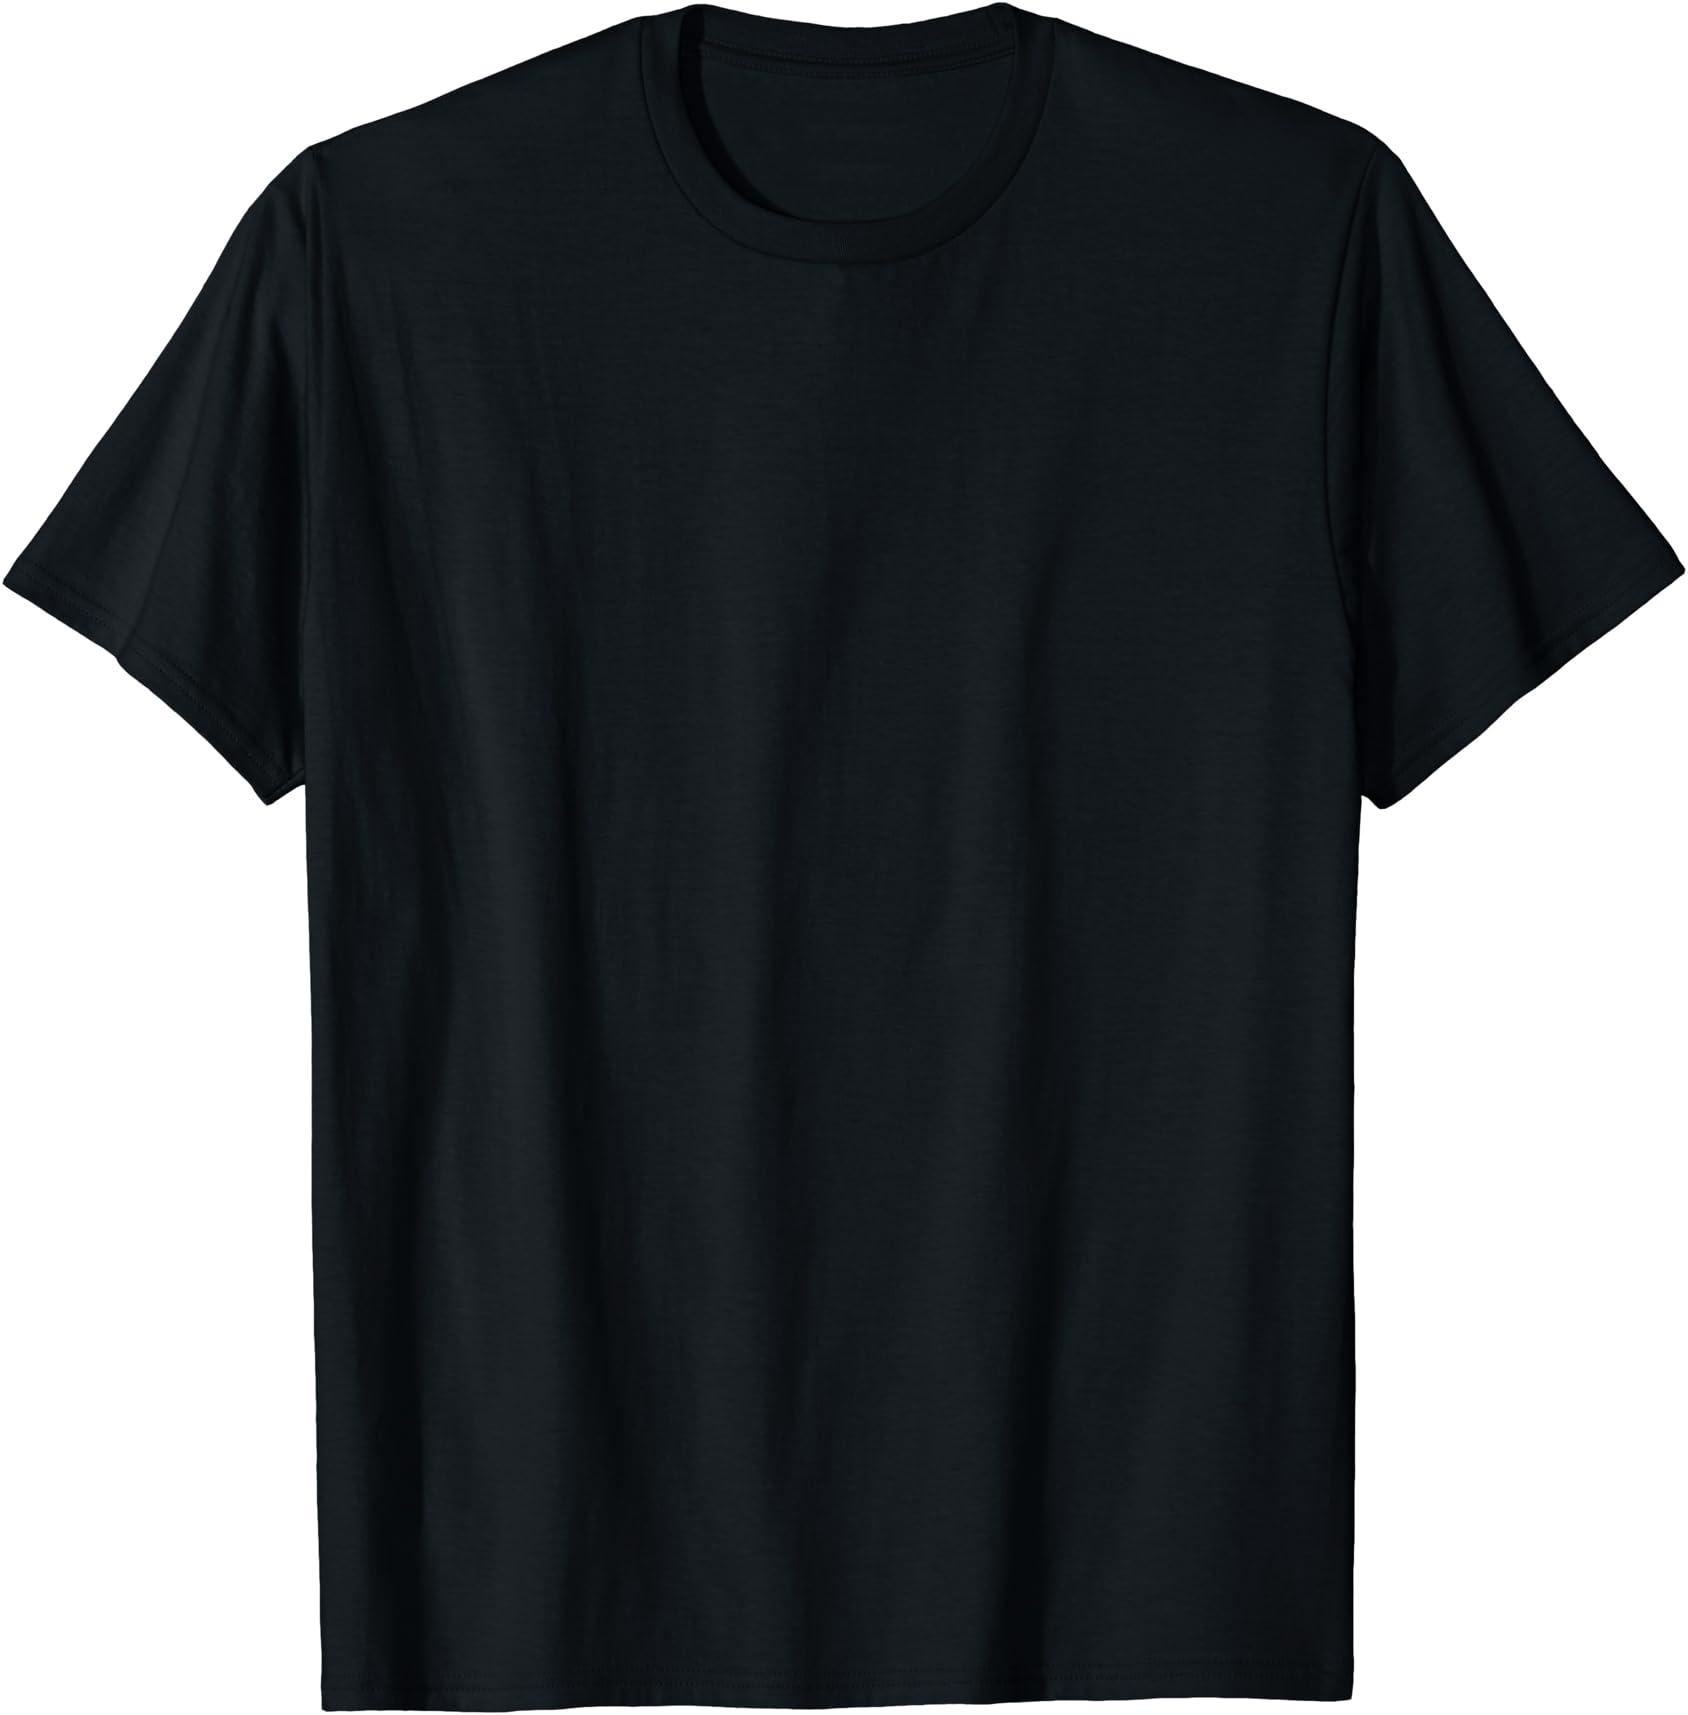 New BASS B.A.S.S Pro Fishing Logo RAPALA Men/'s White Black T-Shirt Size S-3XL